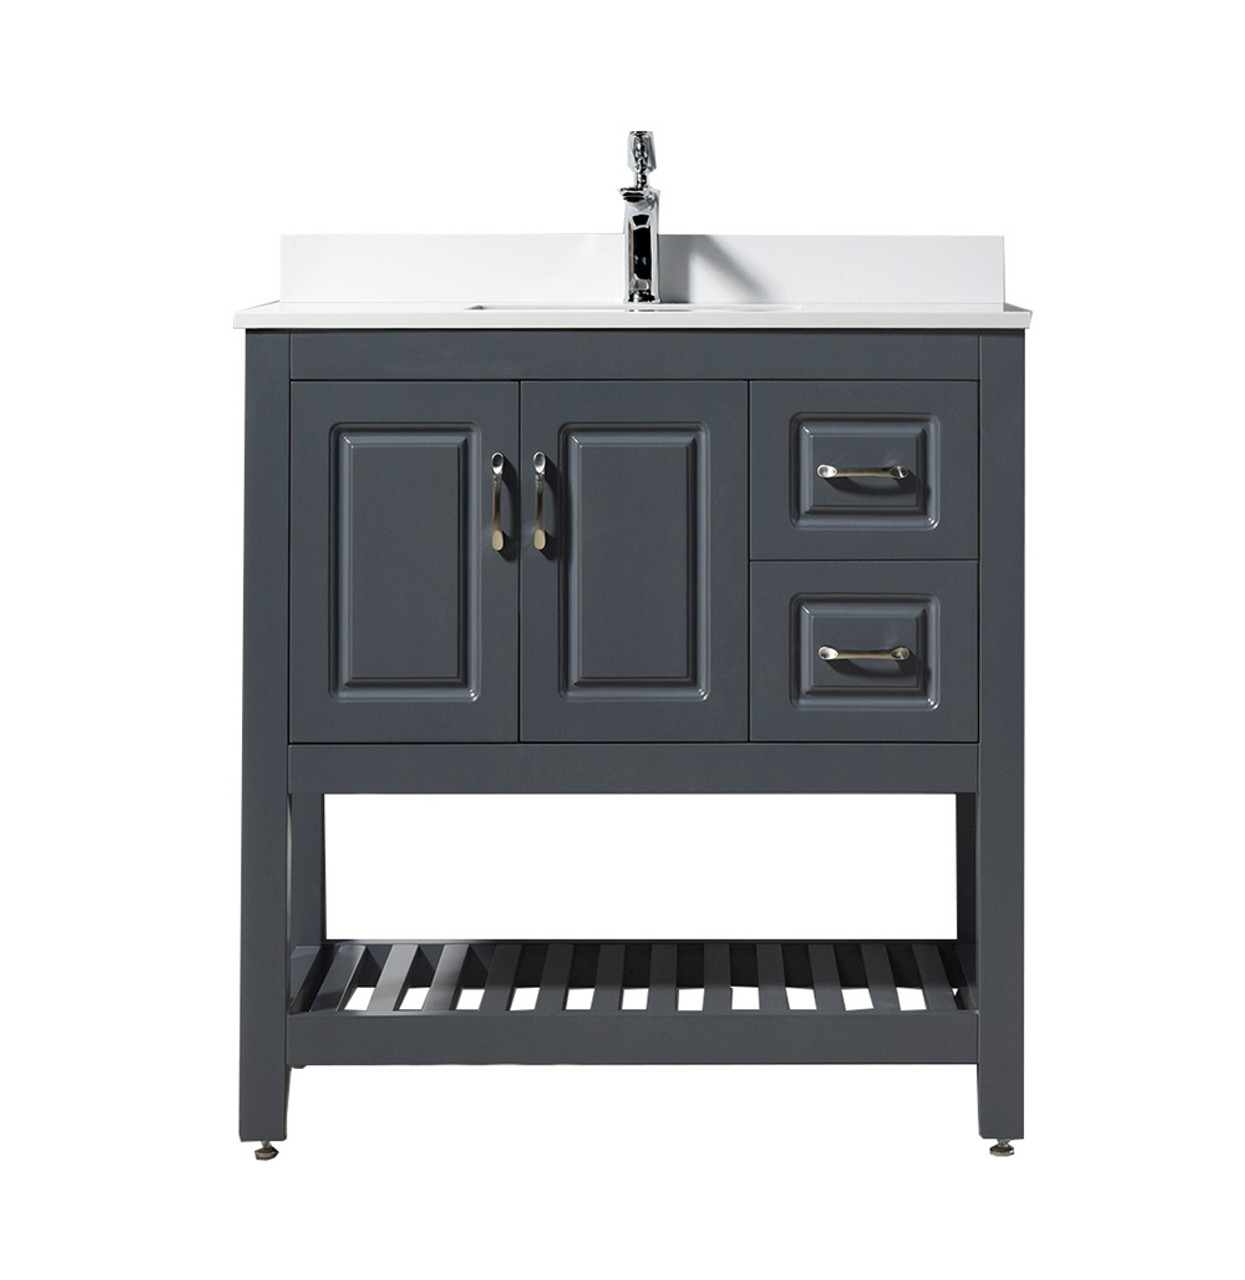 Louis 36 Vanity With White Quartz Top And Ceramic Sink